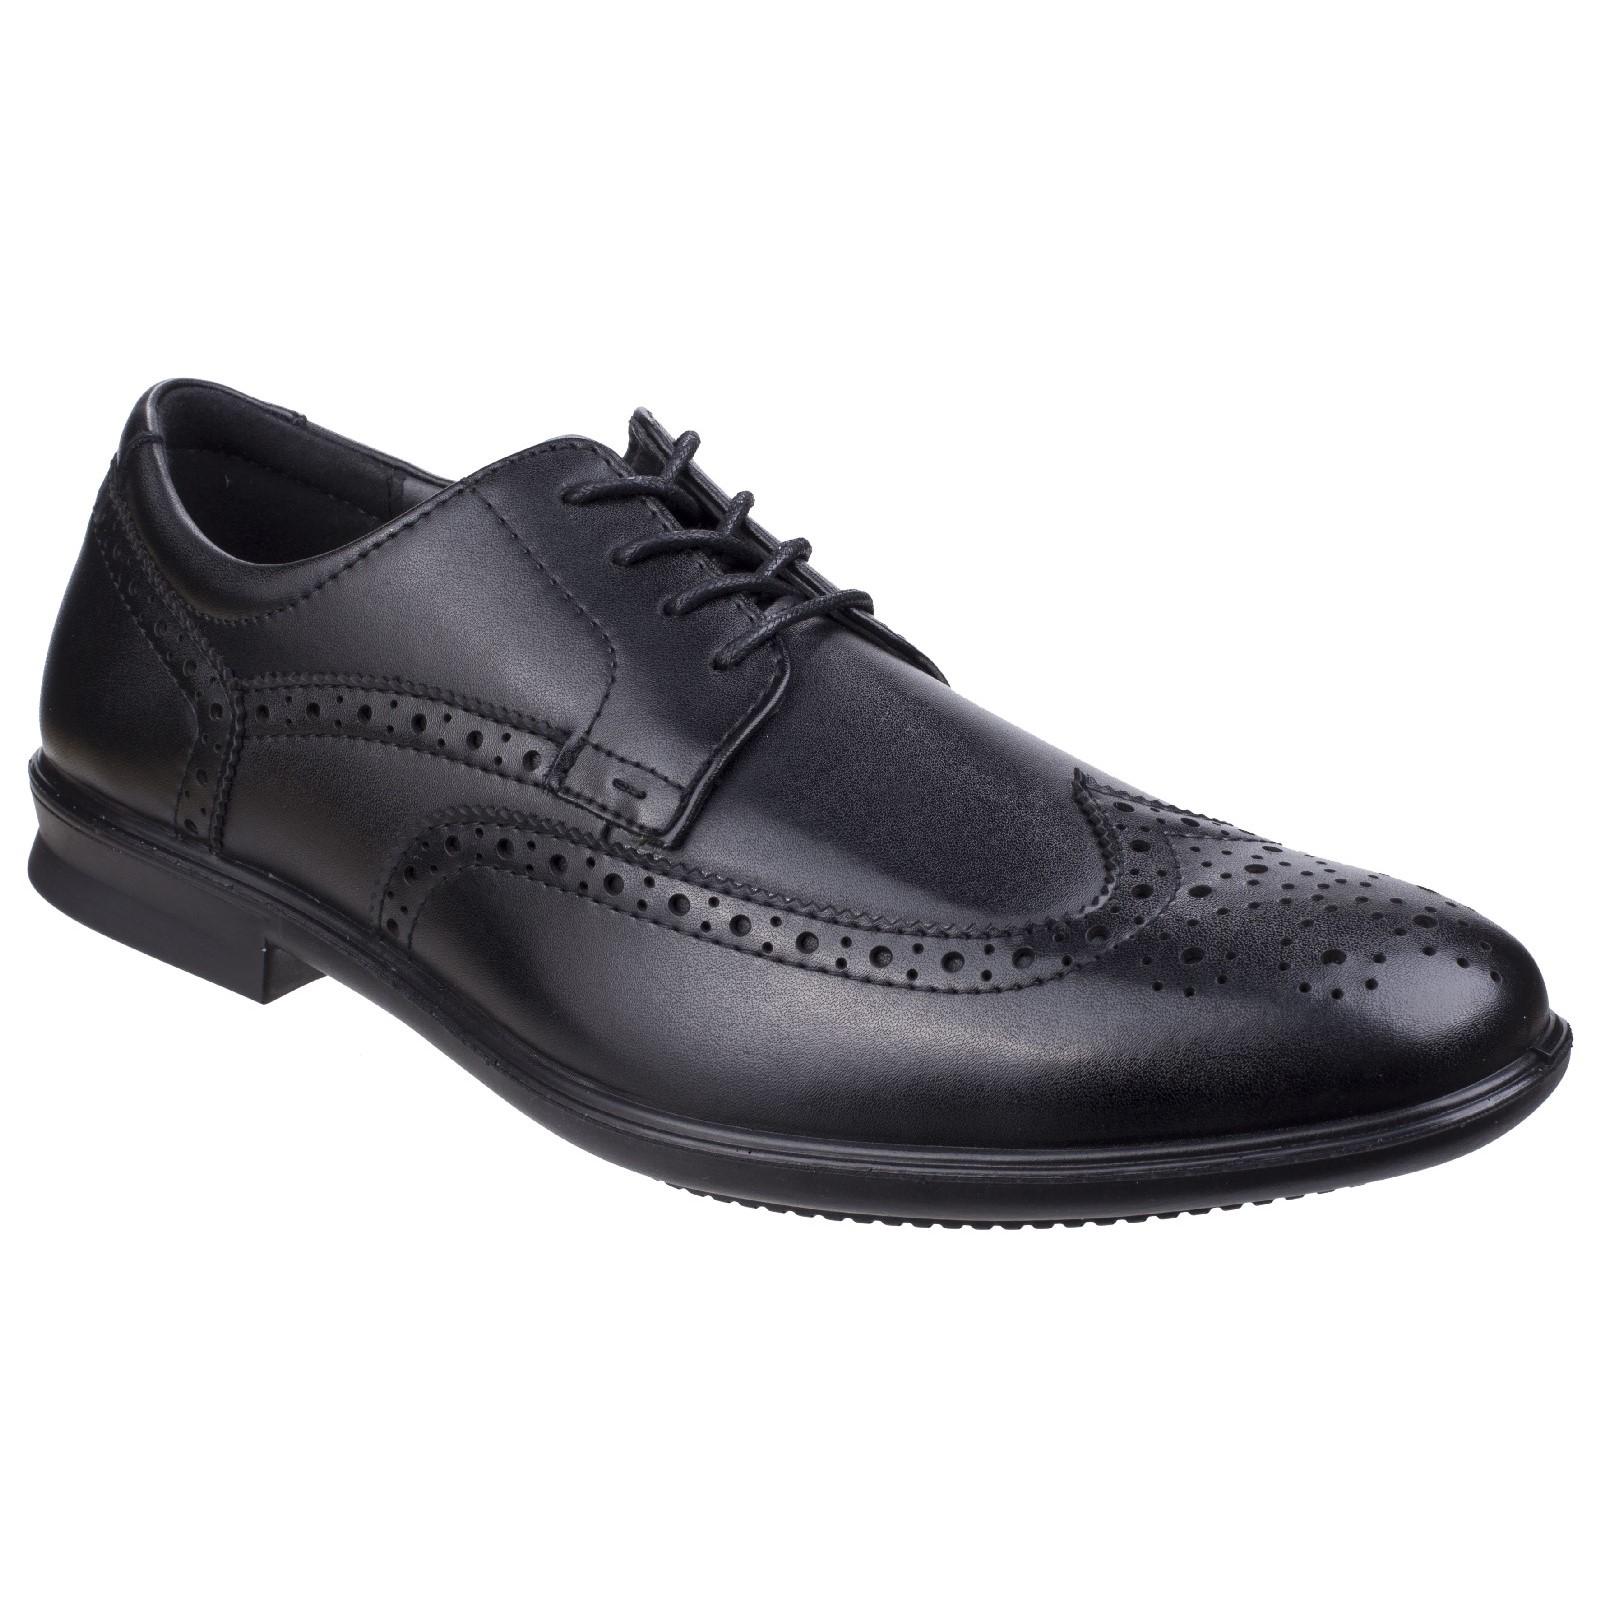 Hush Puppies Para Hombre Cale Oxford Zapato de extremo de ala